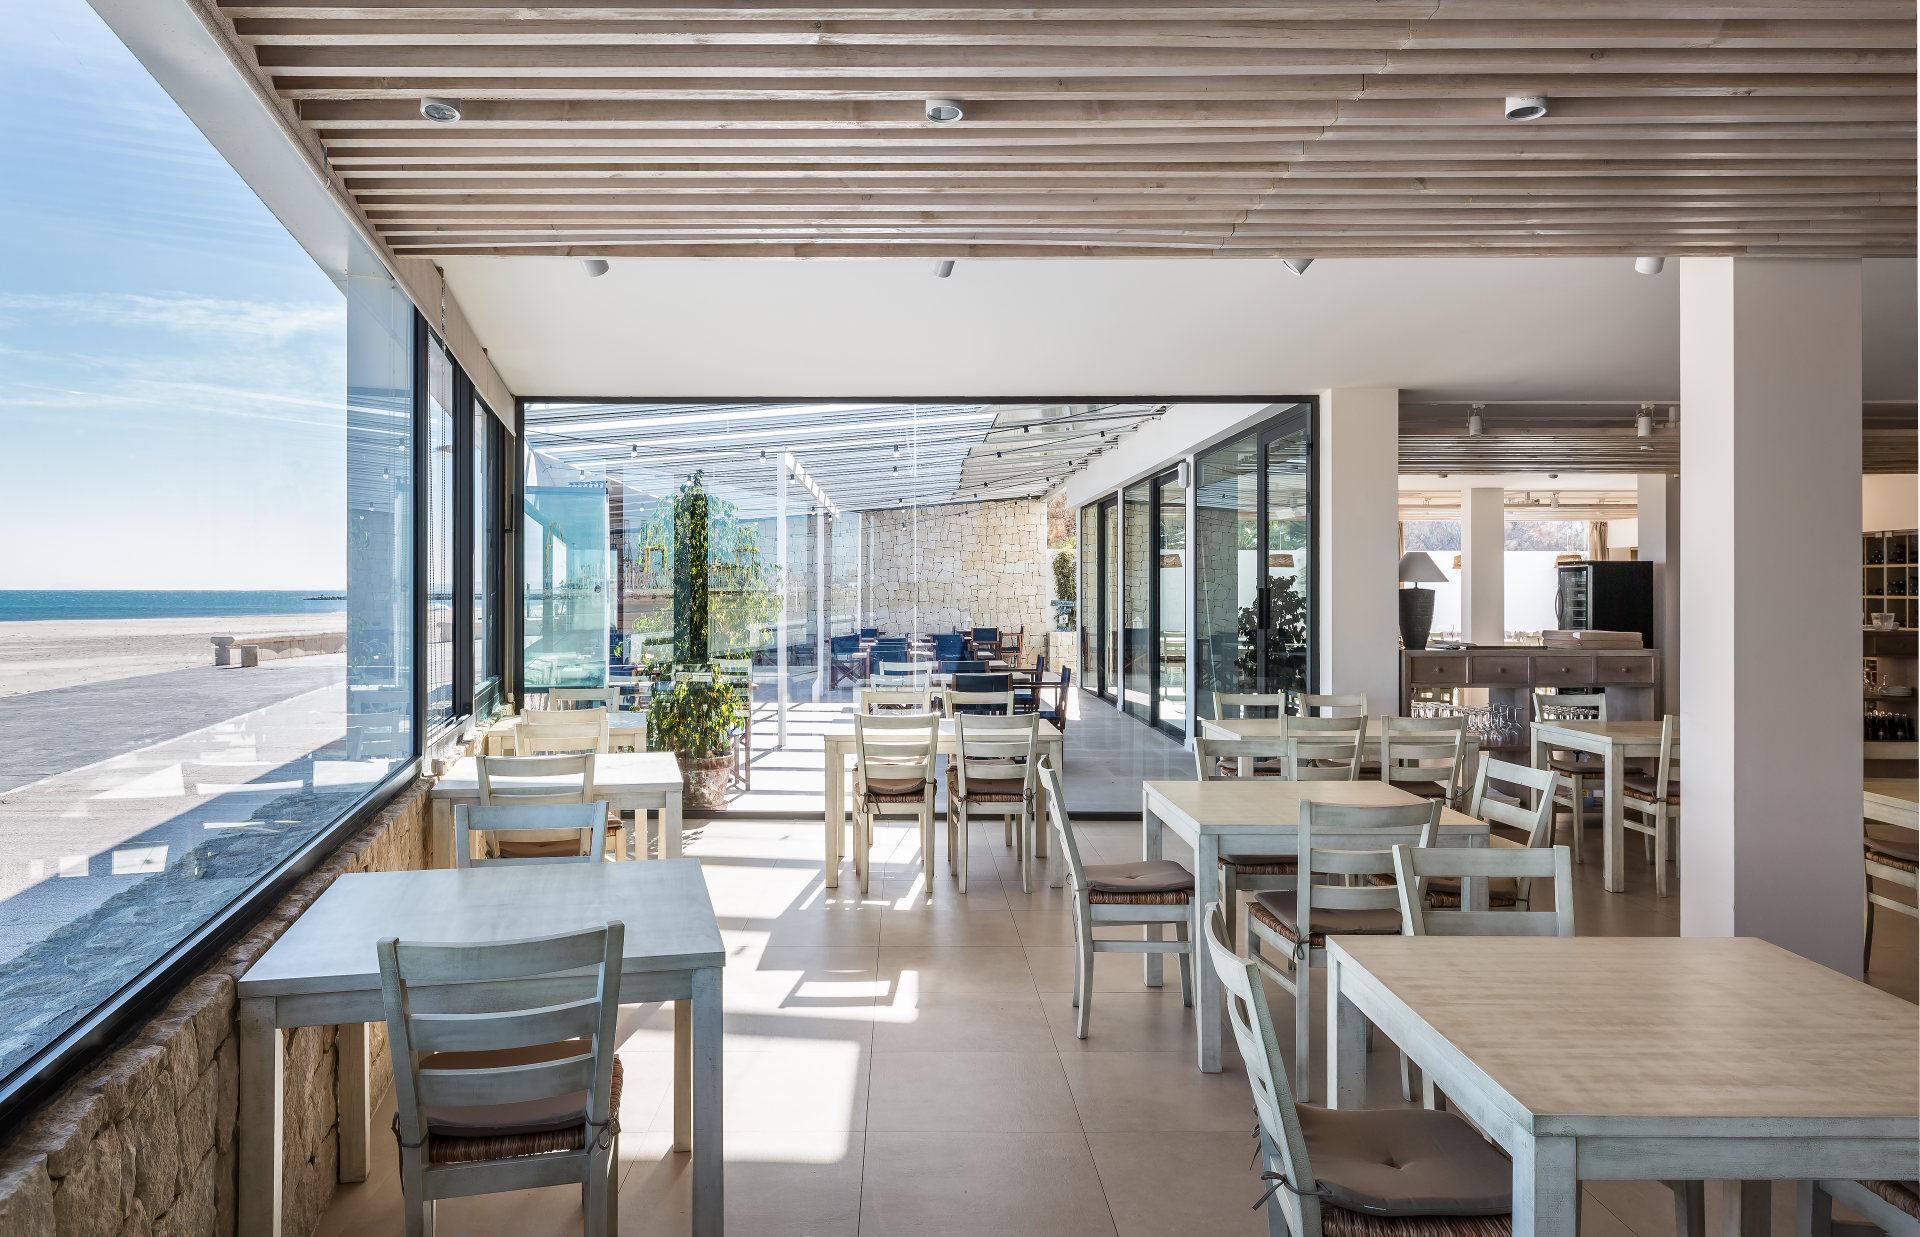 fotografia-arquitectura-valencia-german-cabo-versea-restaurante-ferrera-pinedo (14)